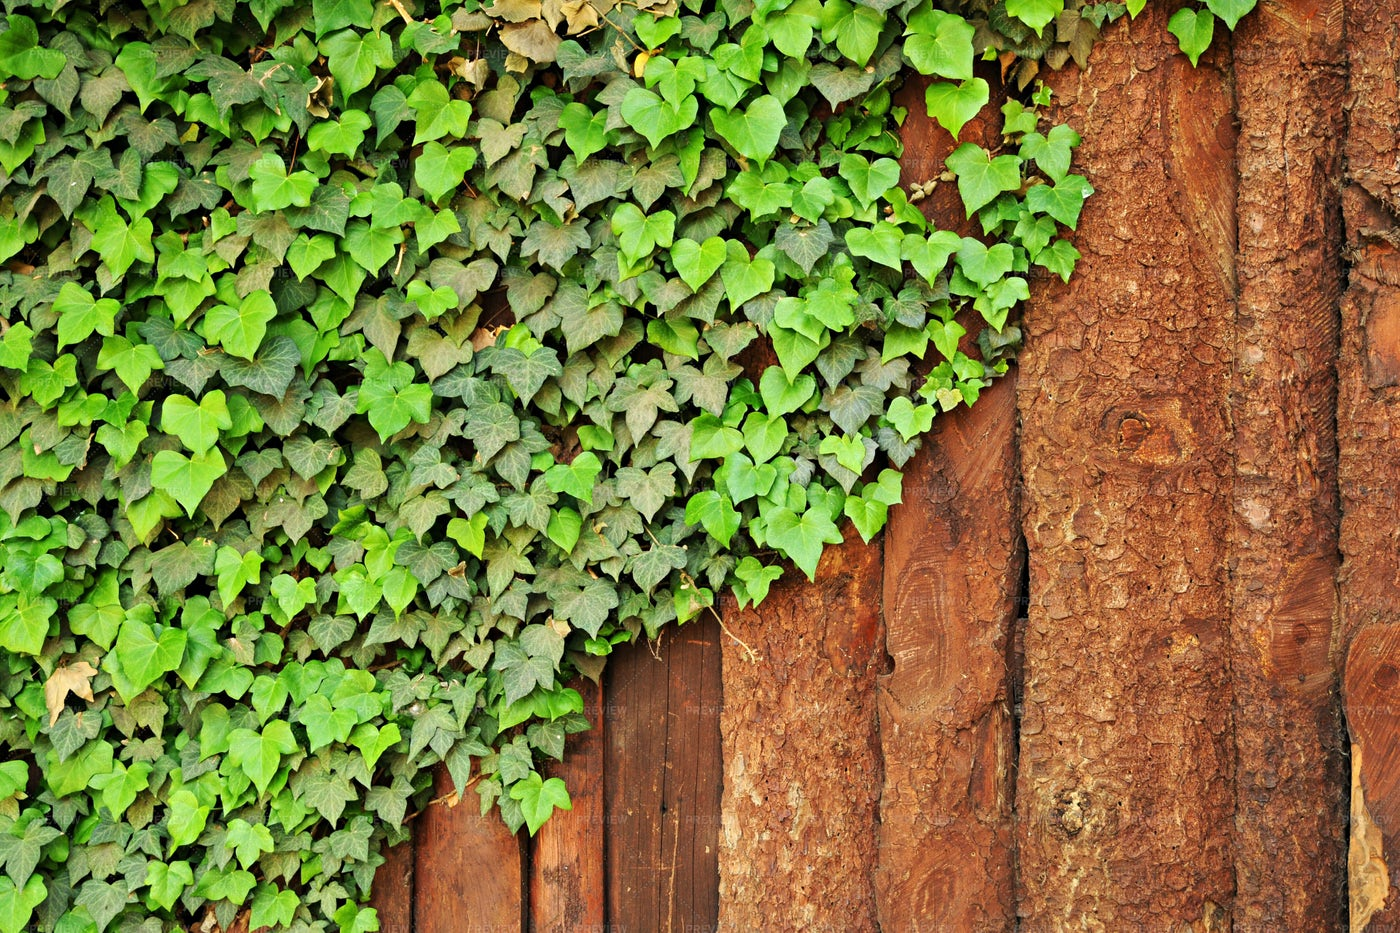 Ivy Creeps Along A Fence: Stock Photos